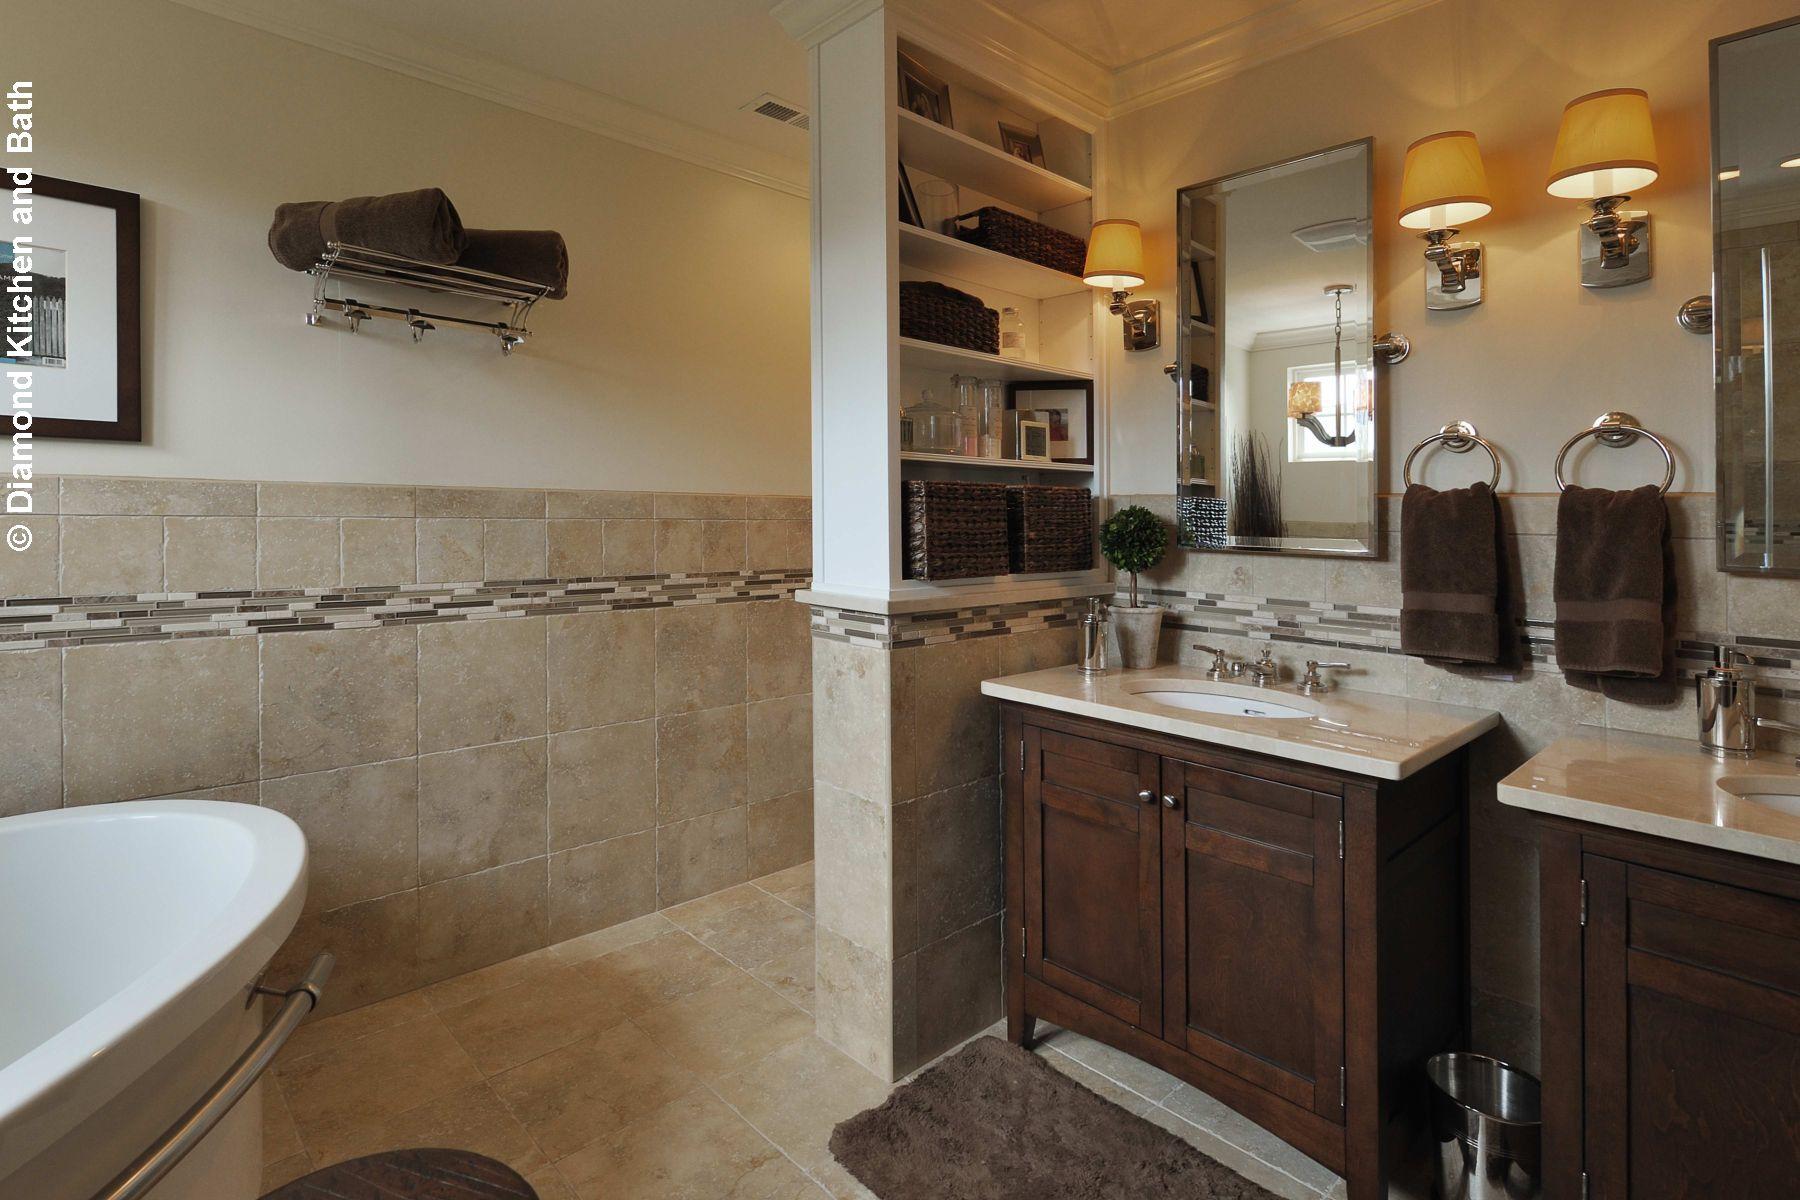 Bathroom Remodeling Yardley Pa diamond kitchen and bath, kitchen and bathroom design, showroom